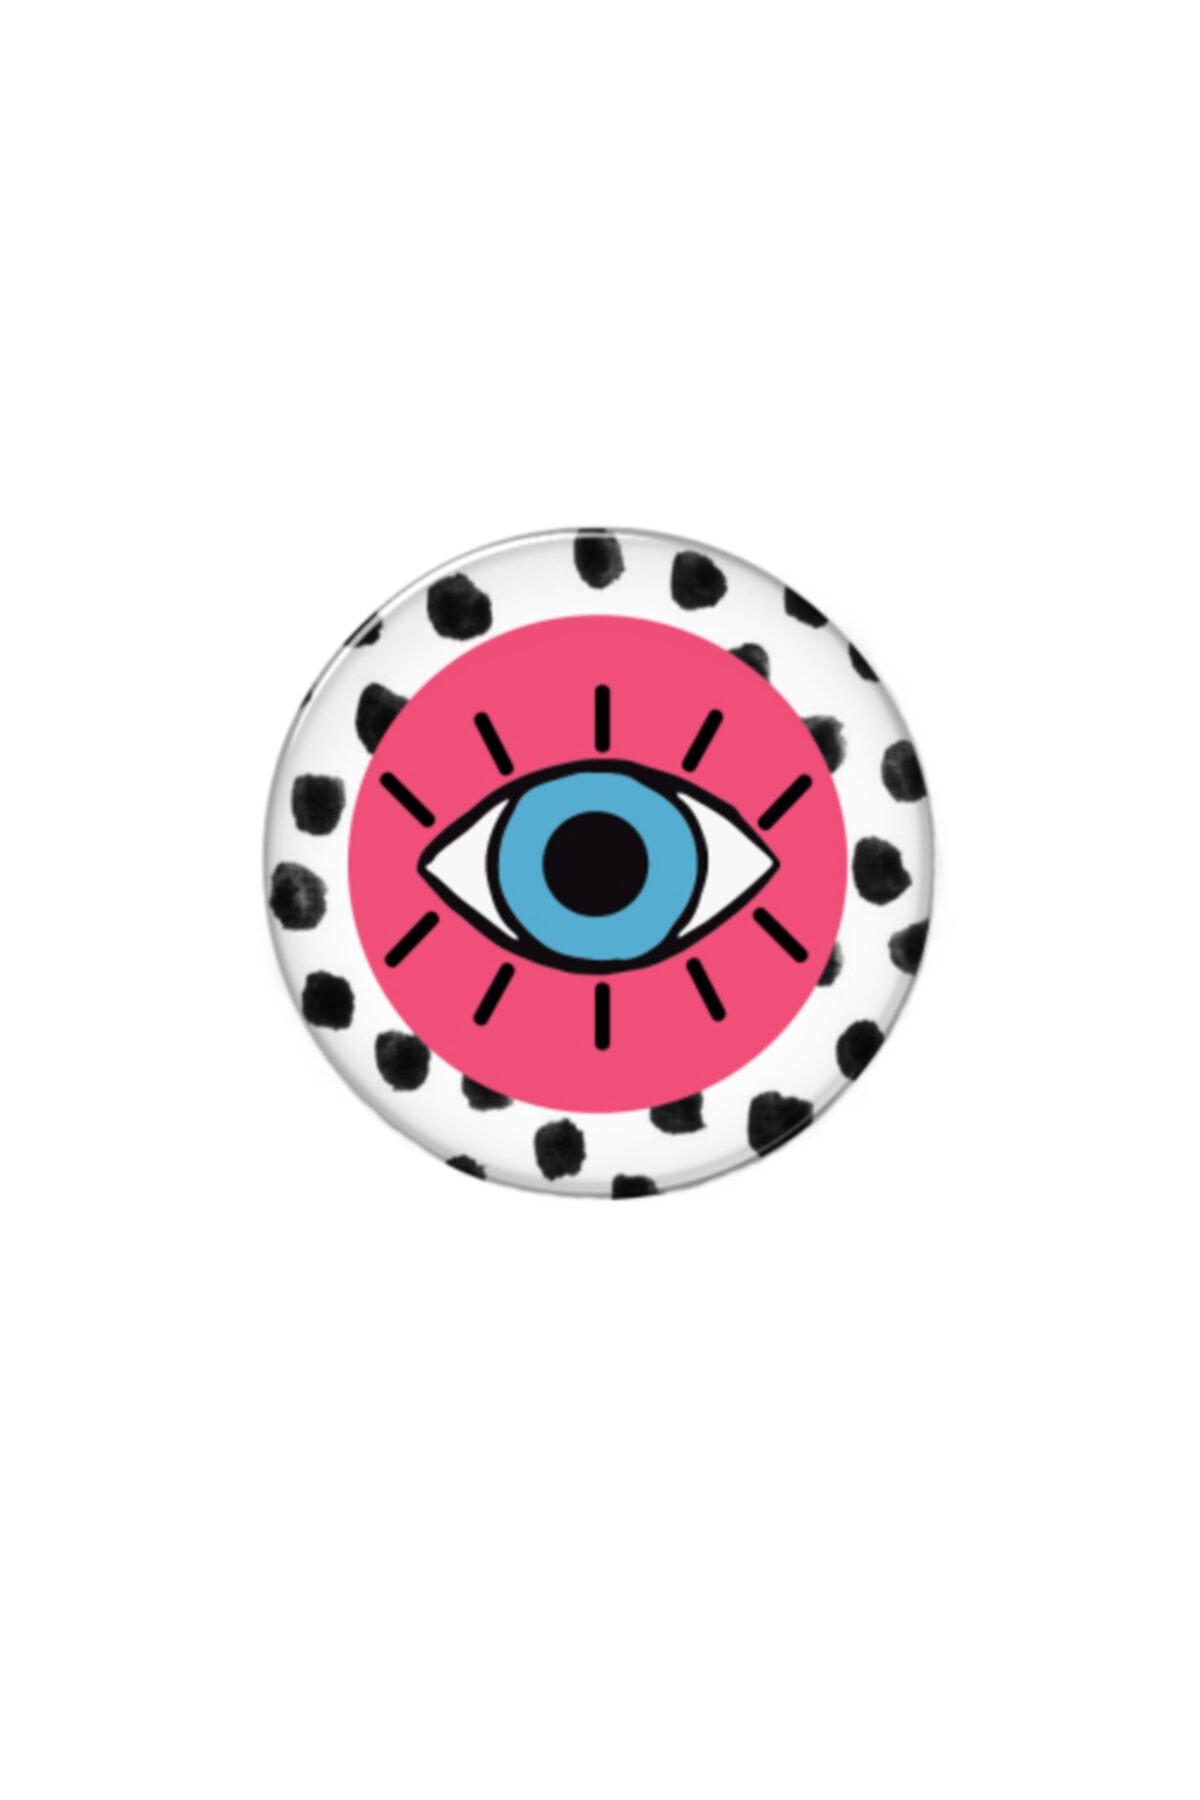 hey lori - Pembe Puan Göz Desen Popsocket 2